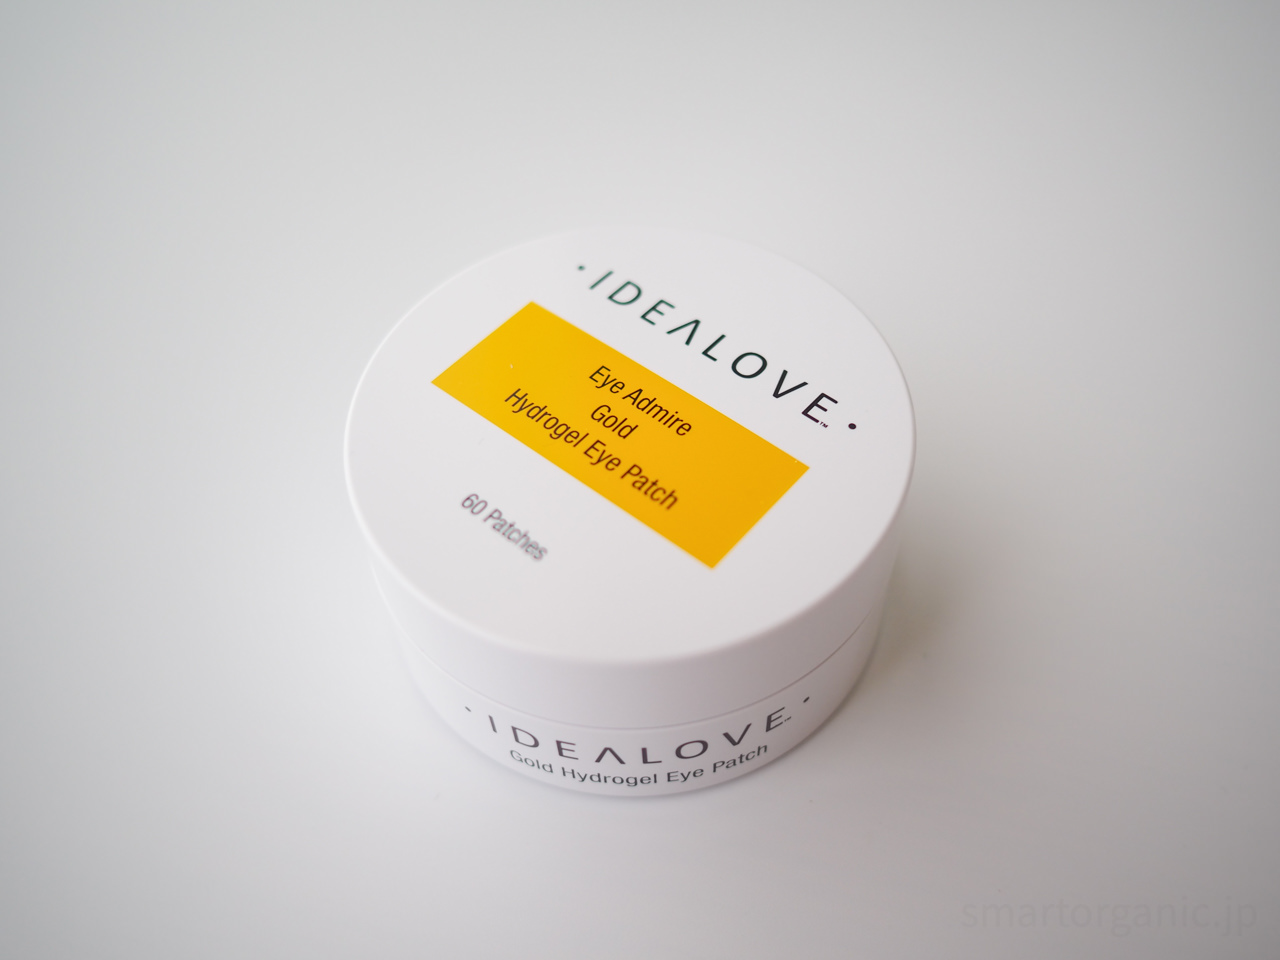 Idealove アイアドマイヤー ゴールド ハイドロゲルアイパッチ 60枚